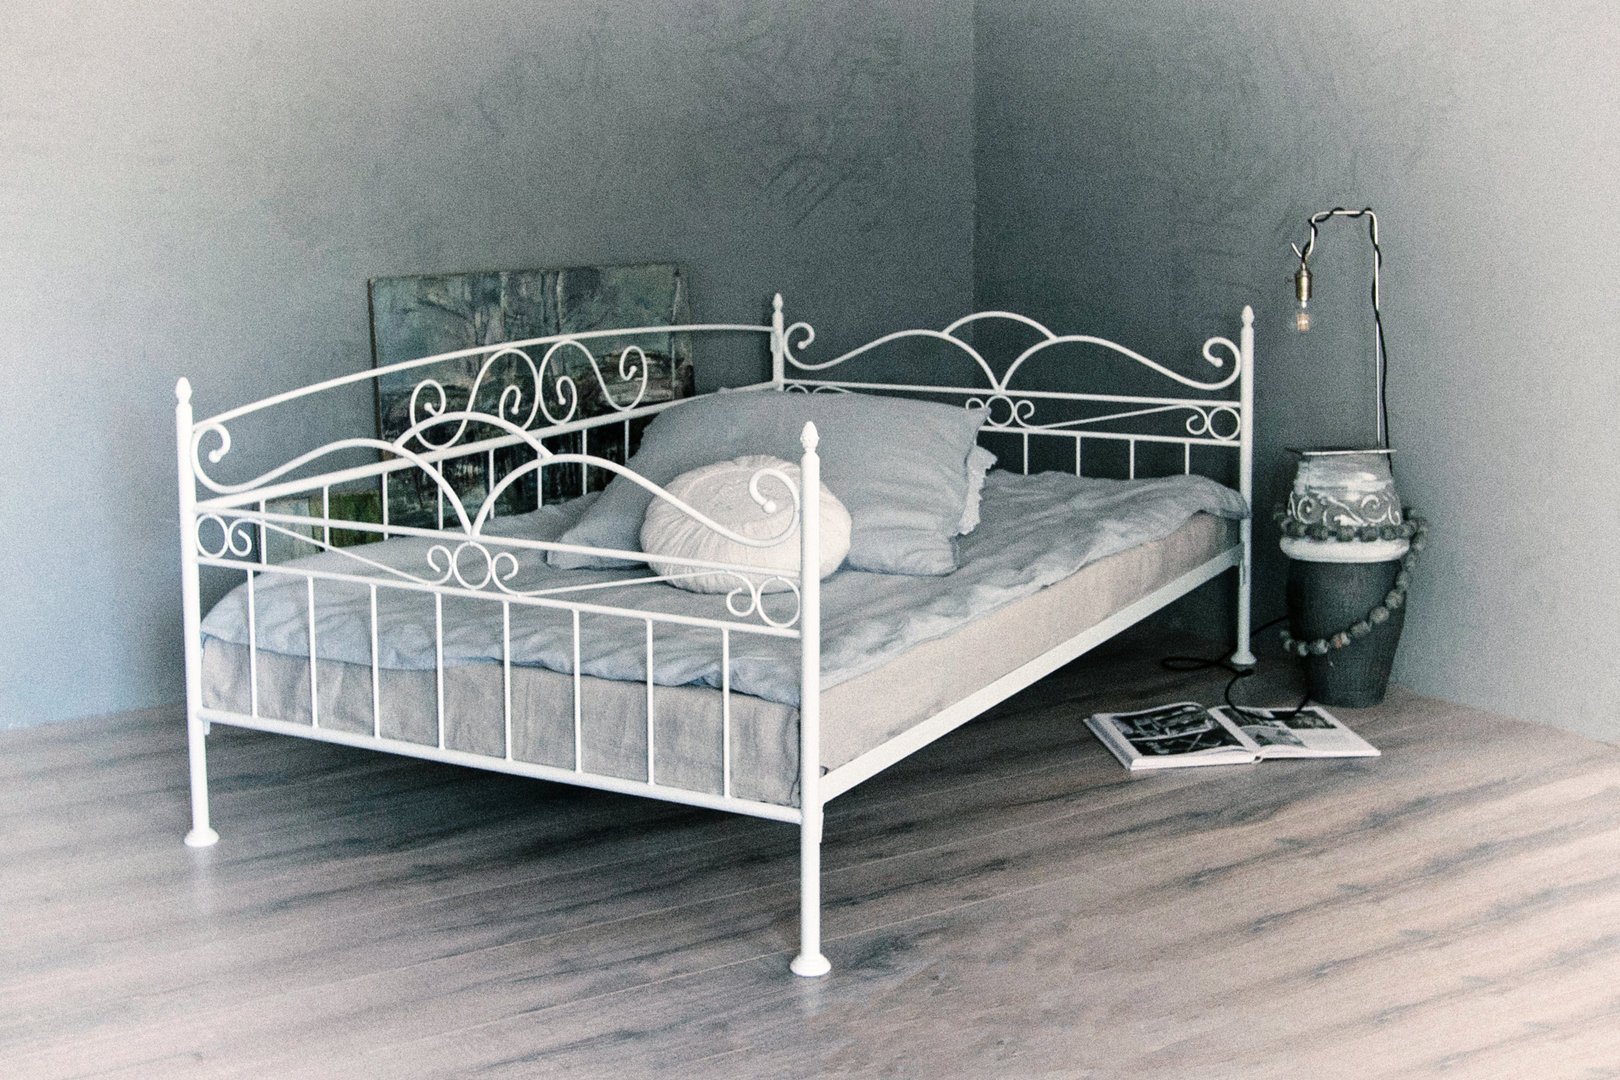 Full Size of Bett Mit Lattenrost Matratze Und 160x200 120x200 90x200 Neues Quietscht Selber Bauen Inklusive Elektrisch Verstellbarem 140x200 Komplett Knarren Knarrt Trend Bett Bett Lattenrost